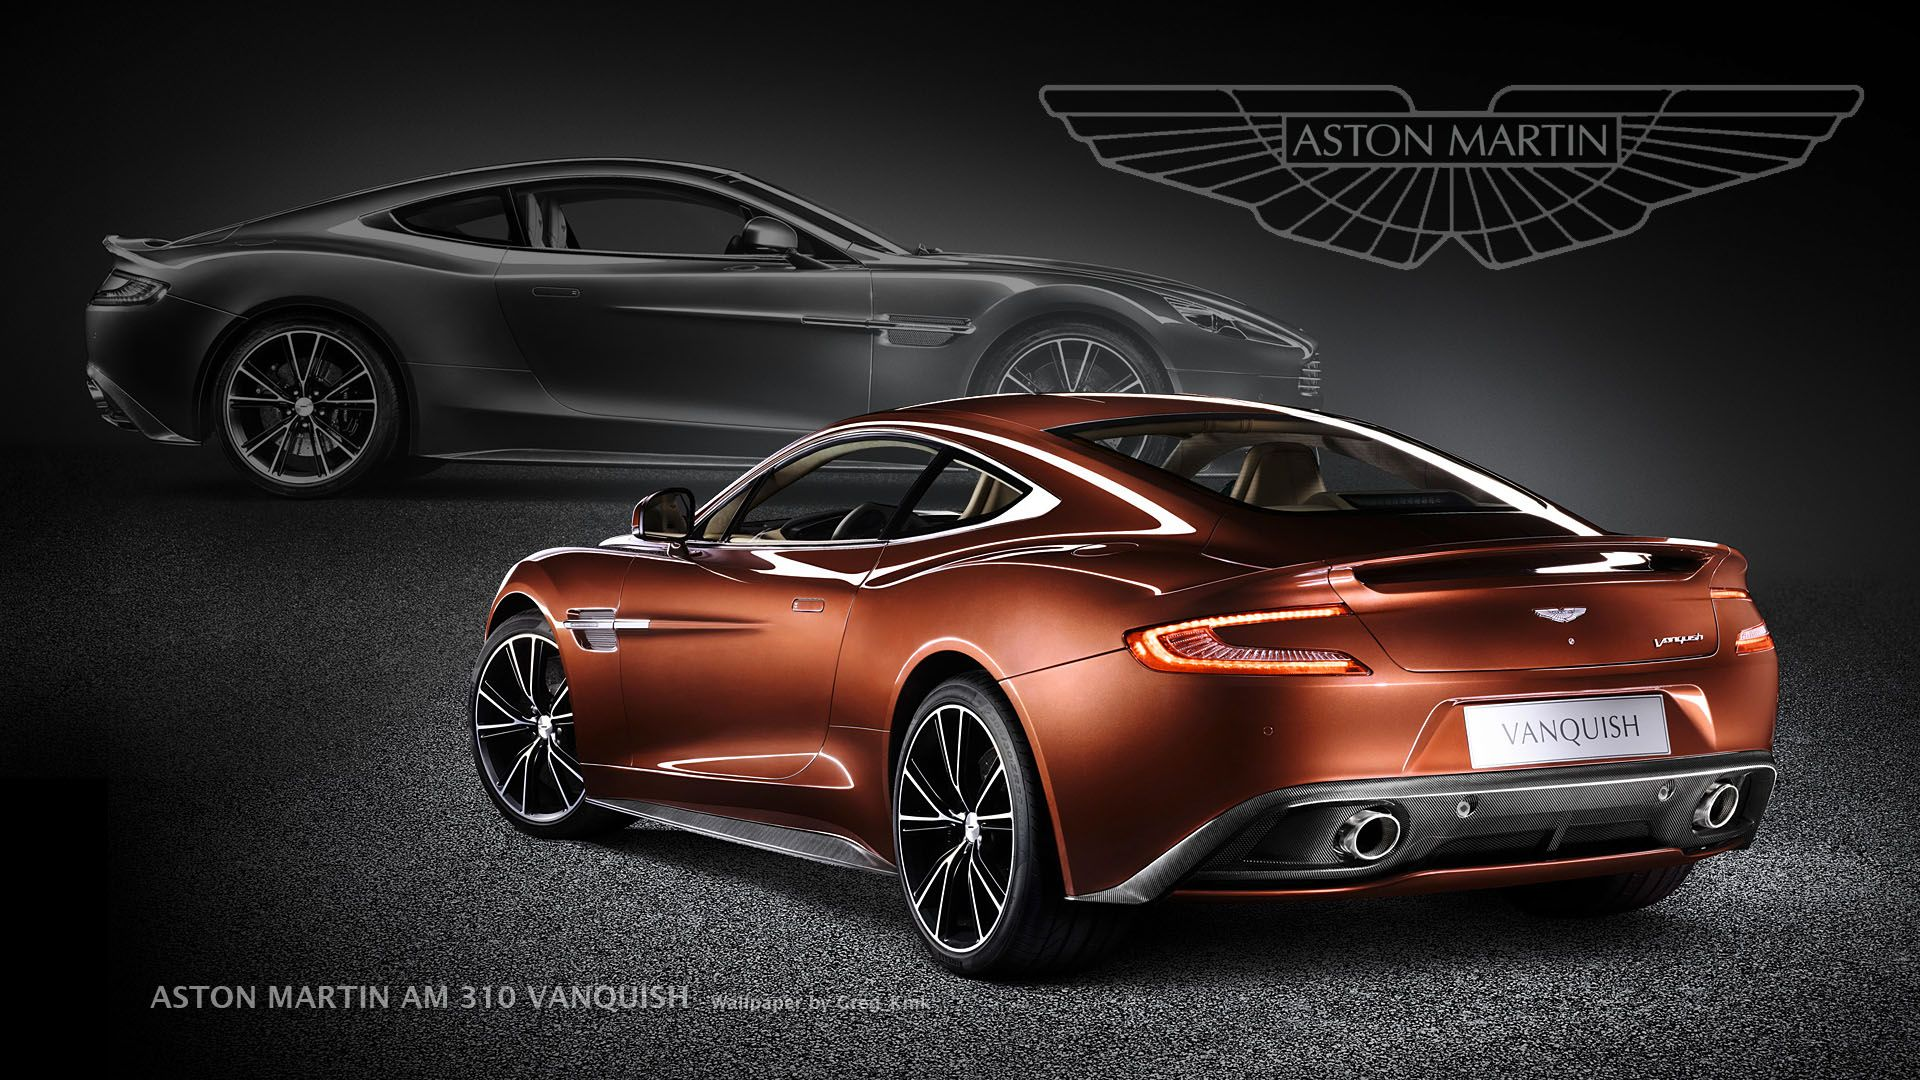 Aston Martin Vanquish Wallpaper Google Search Aston Martin Vanquish Aston Martin Vanquish Wallpapers Aston Martin